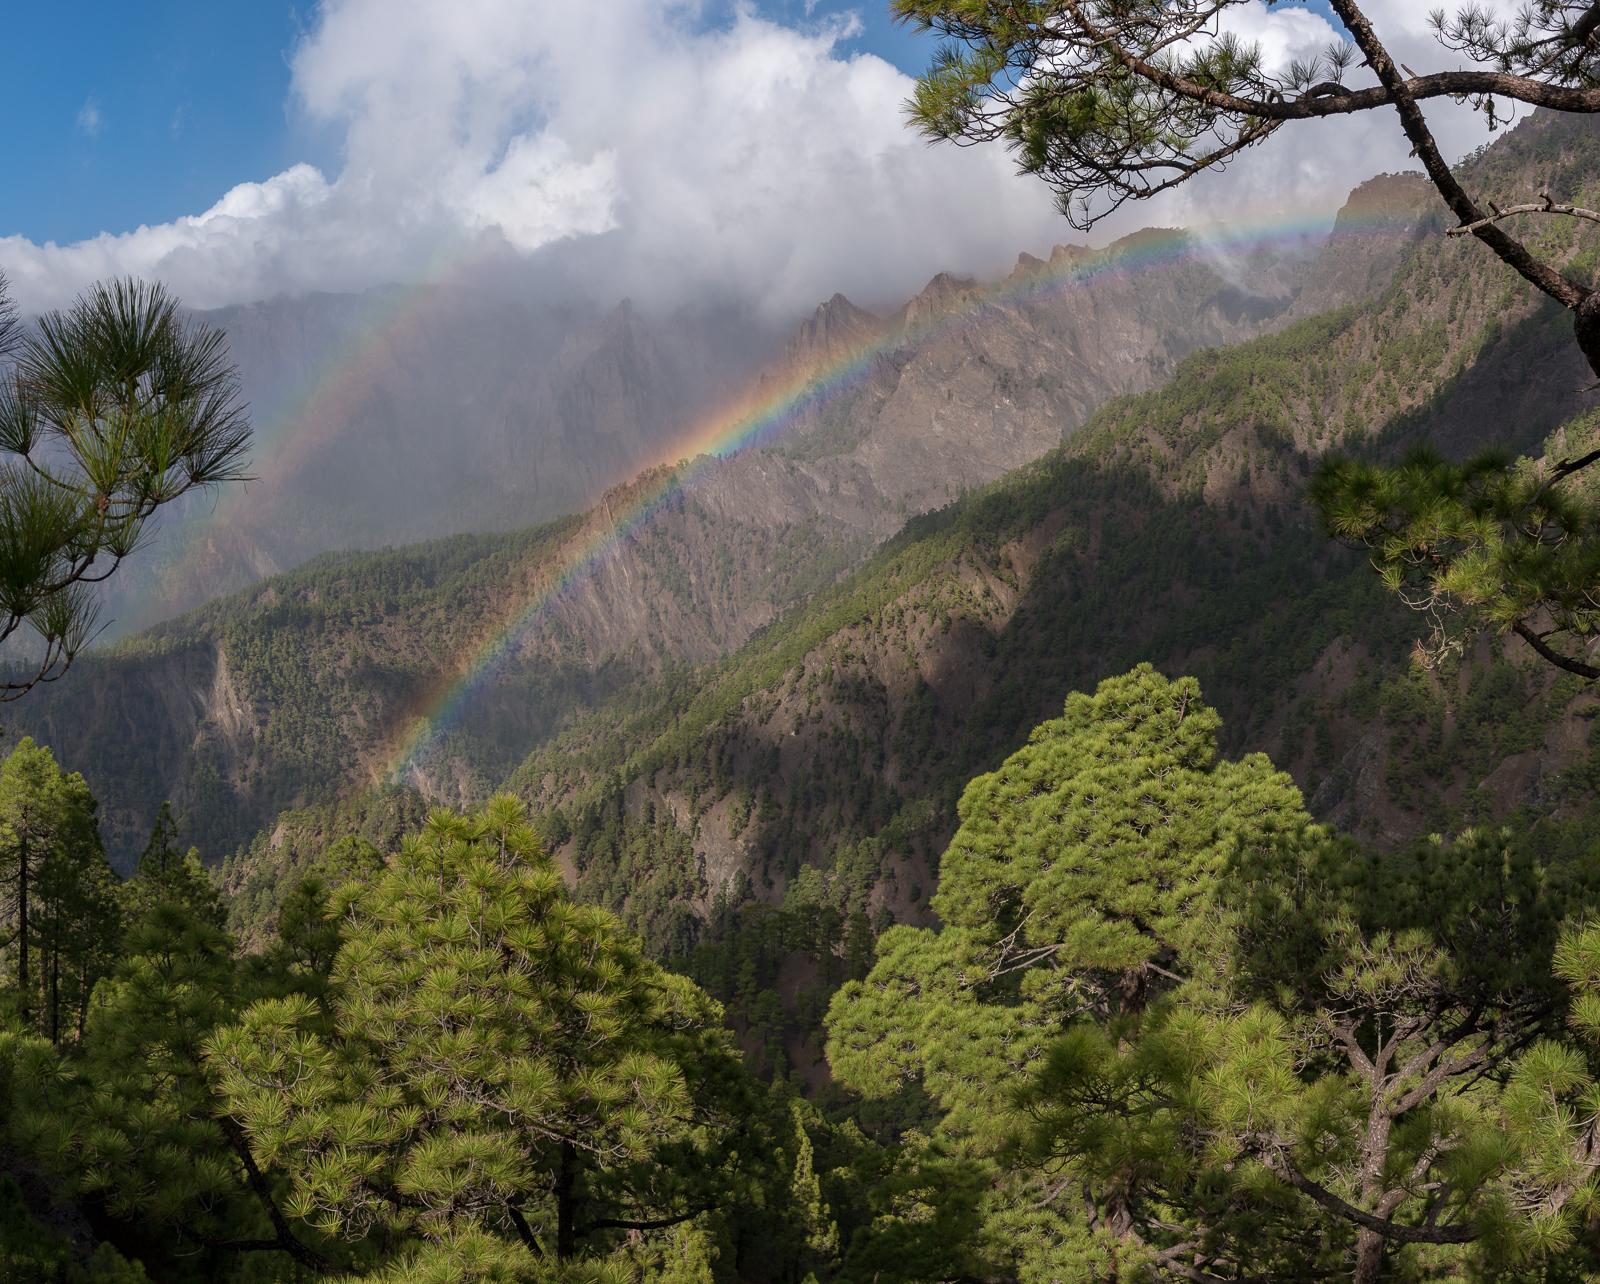 Regenbogen in der Caldera de Taburiente